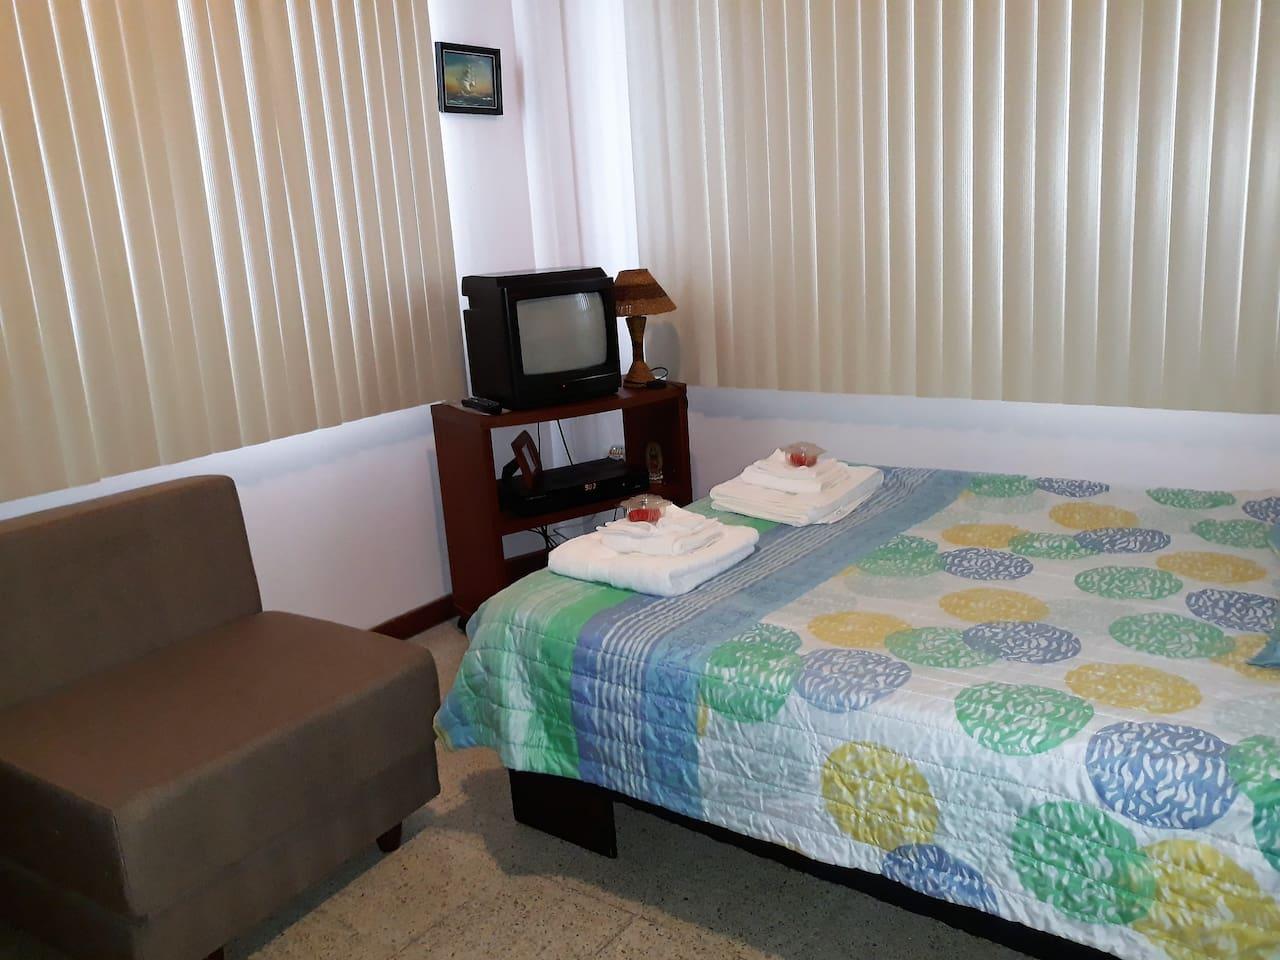 Bedroom 2: 1 Full bed and 1 single sofa bed. Sleeps 3